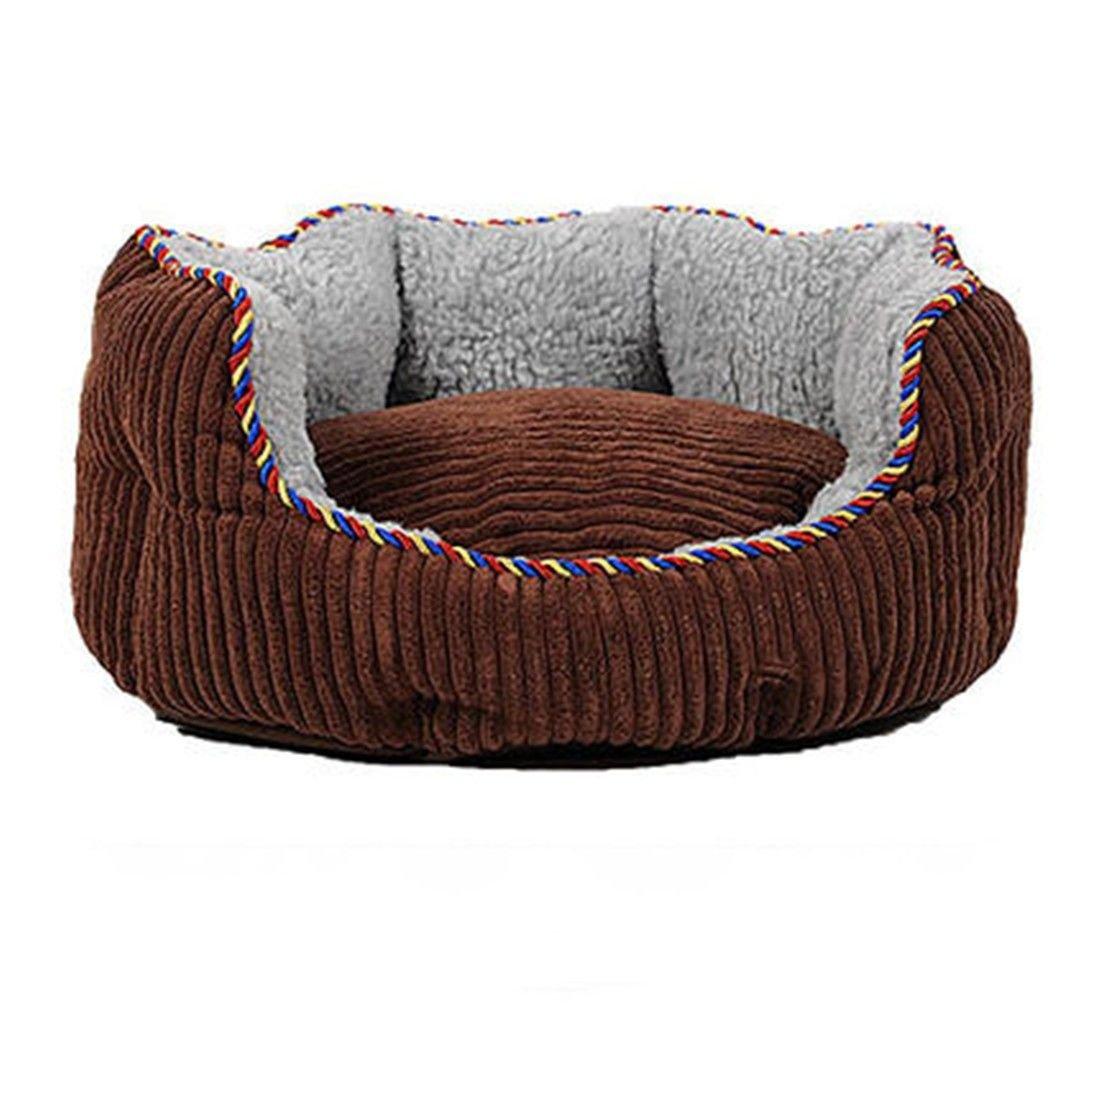 S 60CM STAZSX Teddy Kennel Sofa Dog Bed Washable golden Retriever Small Medium Large Dog cat Litter pet Supplies Four Seasons Universal, S  60CM